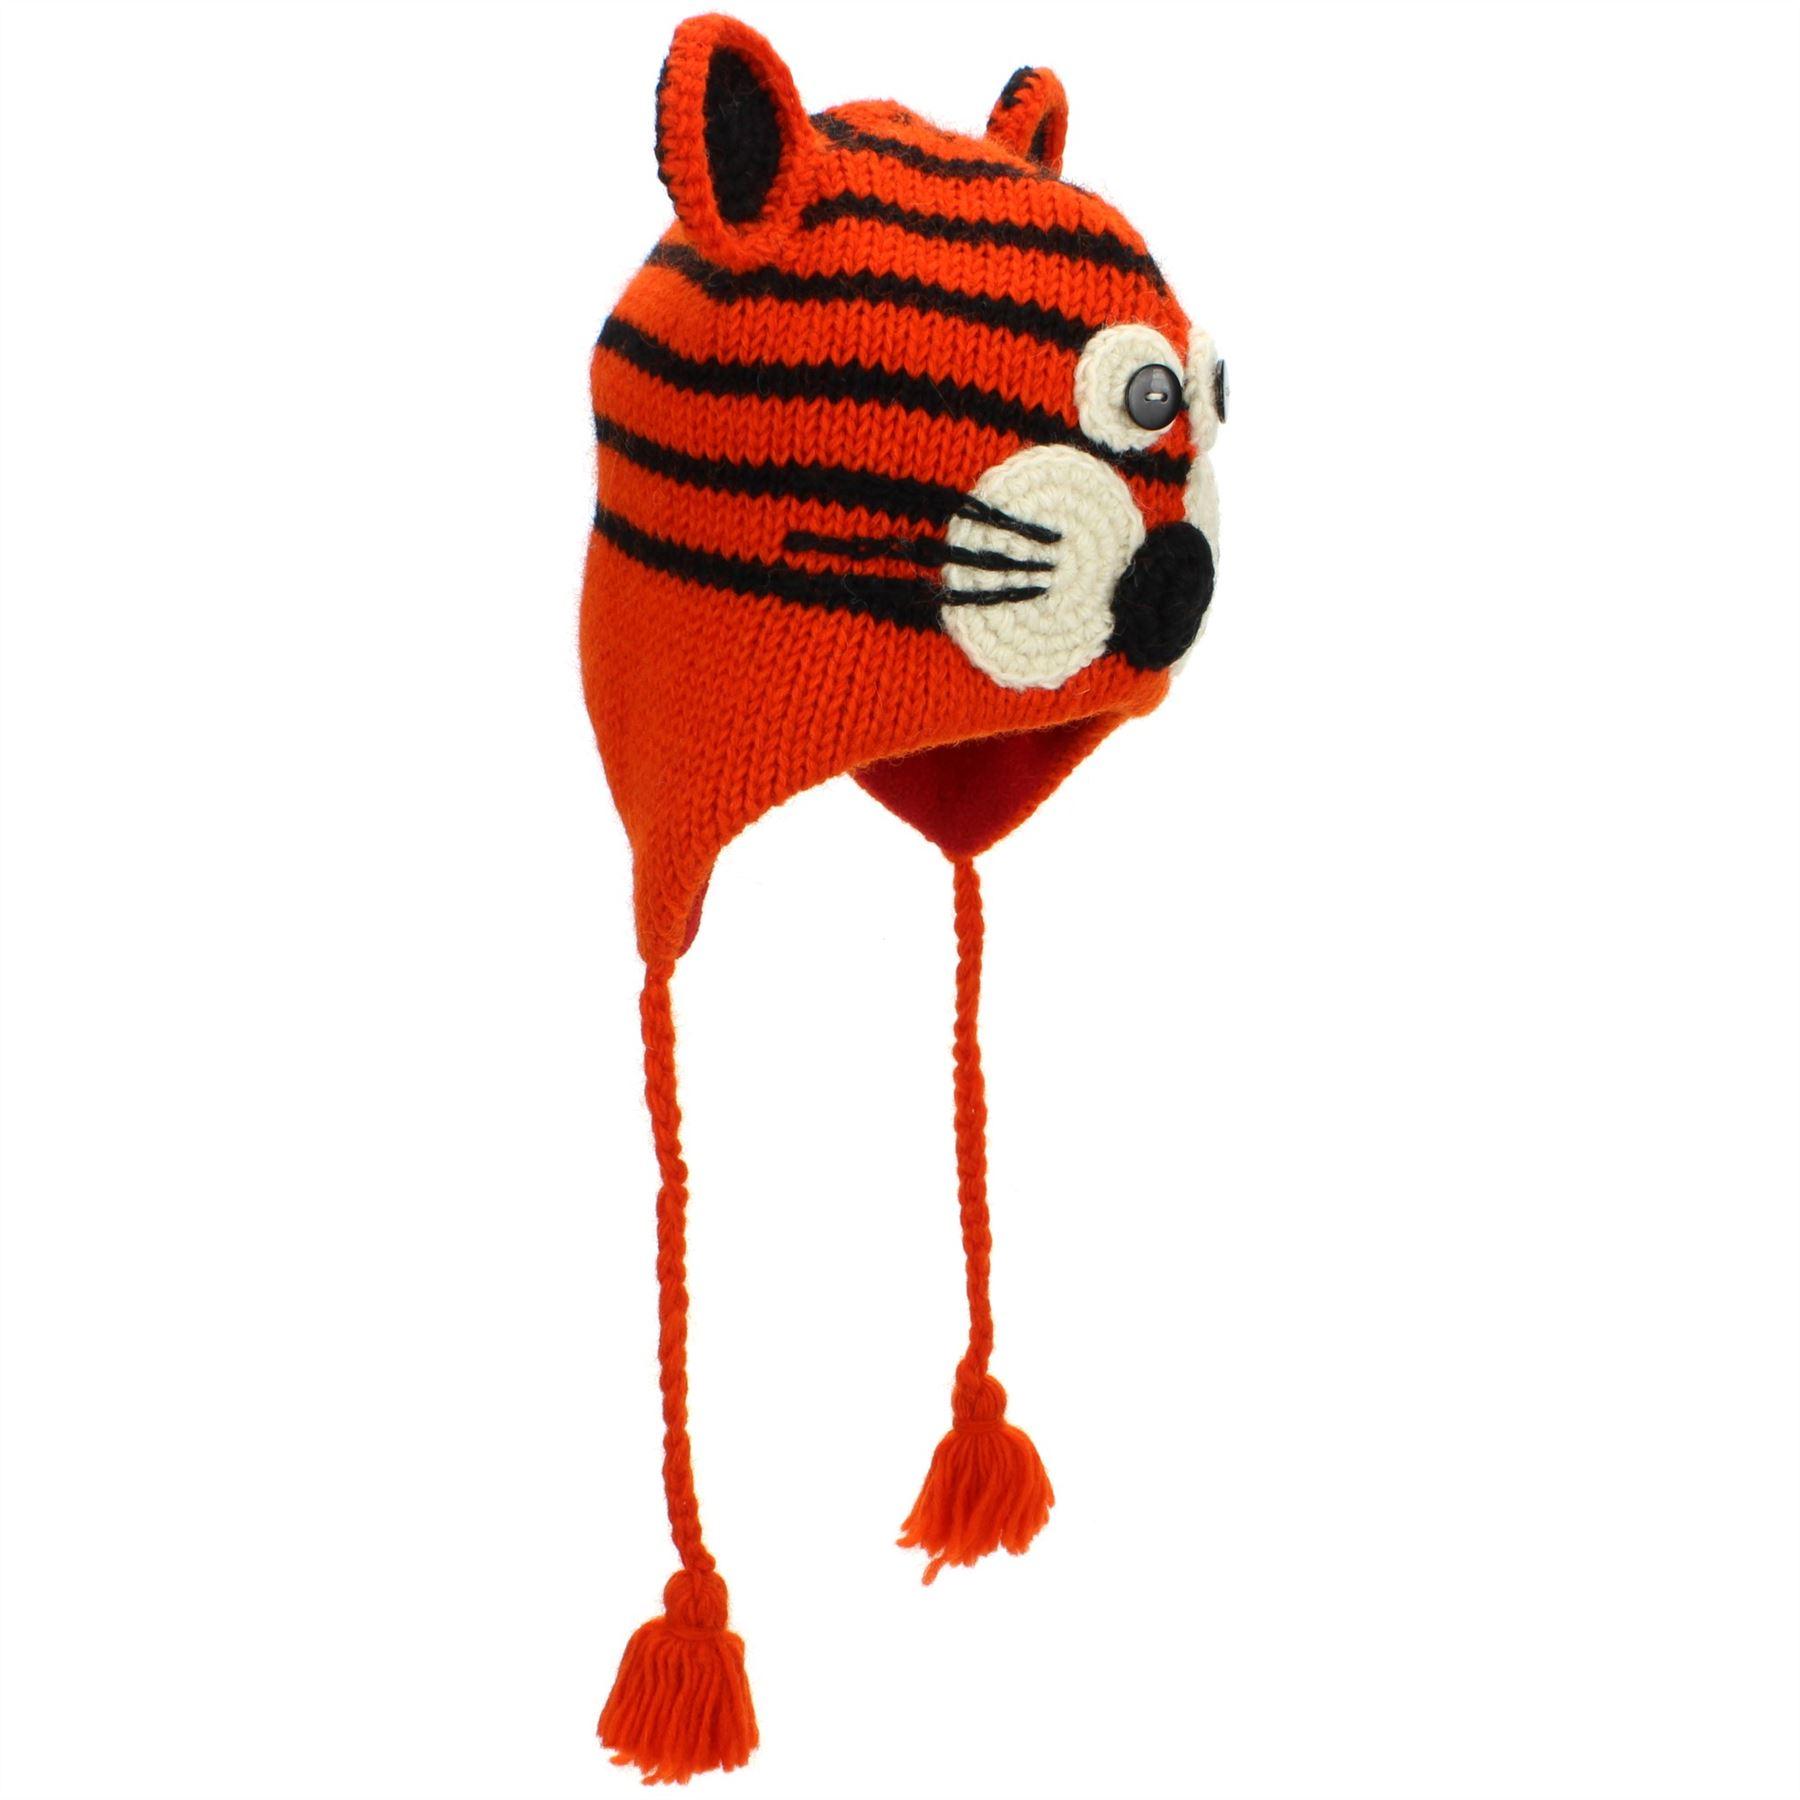 Animal De Lana Sombrero de Lana Forrada Unisex Tejido Abrigado de Invierno Mono Tigre Fox